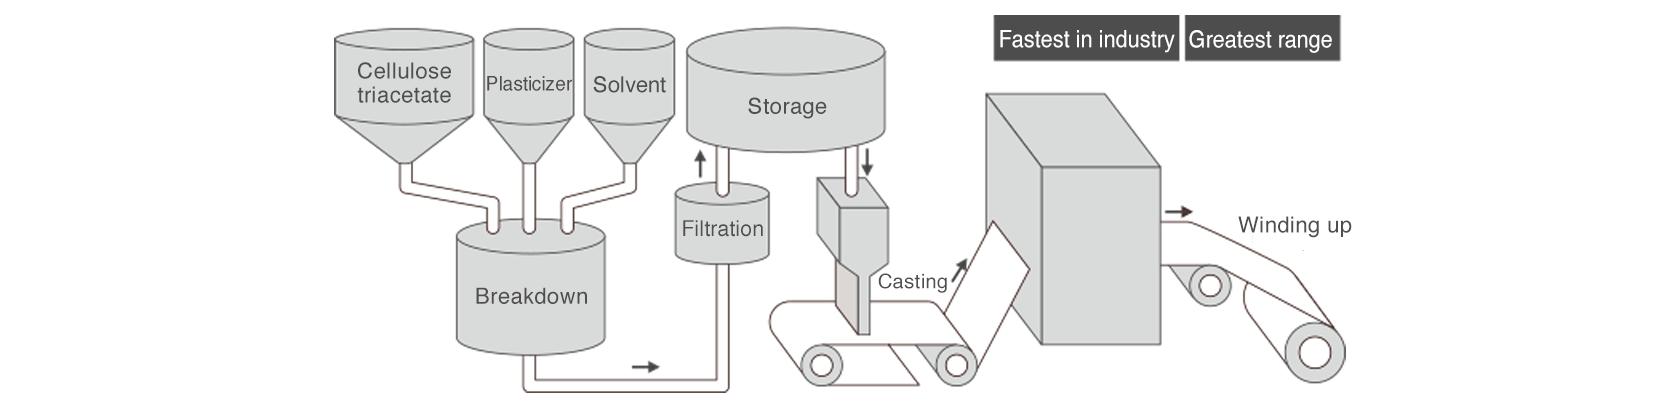 [image] Solvent Membrane Creation Technologies